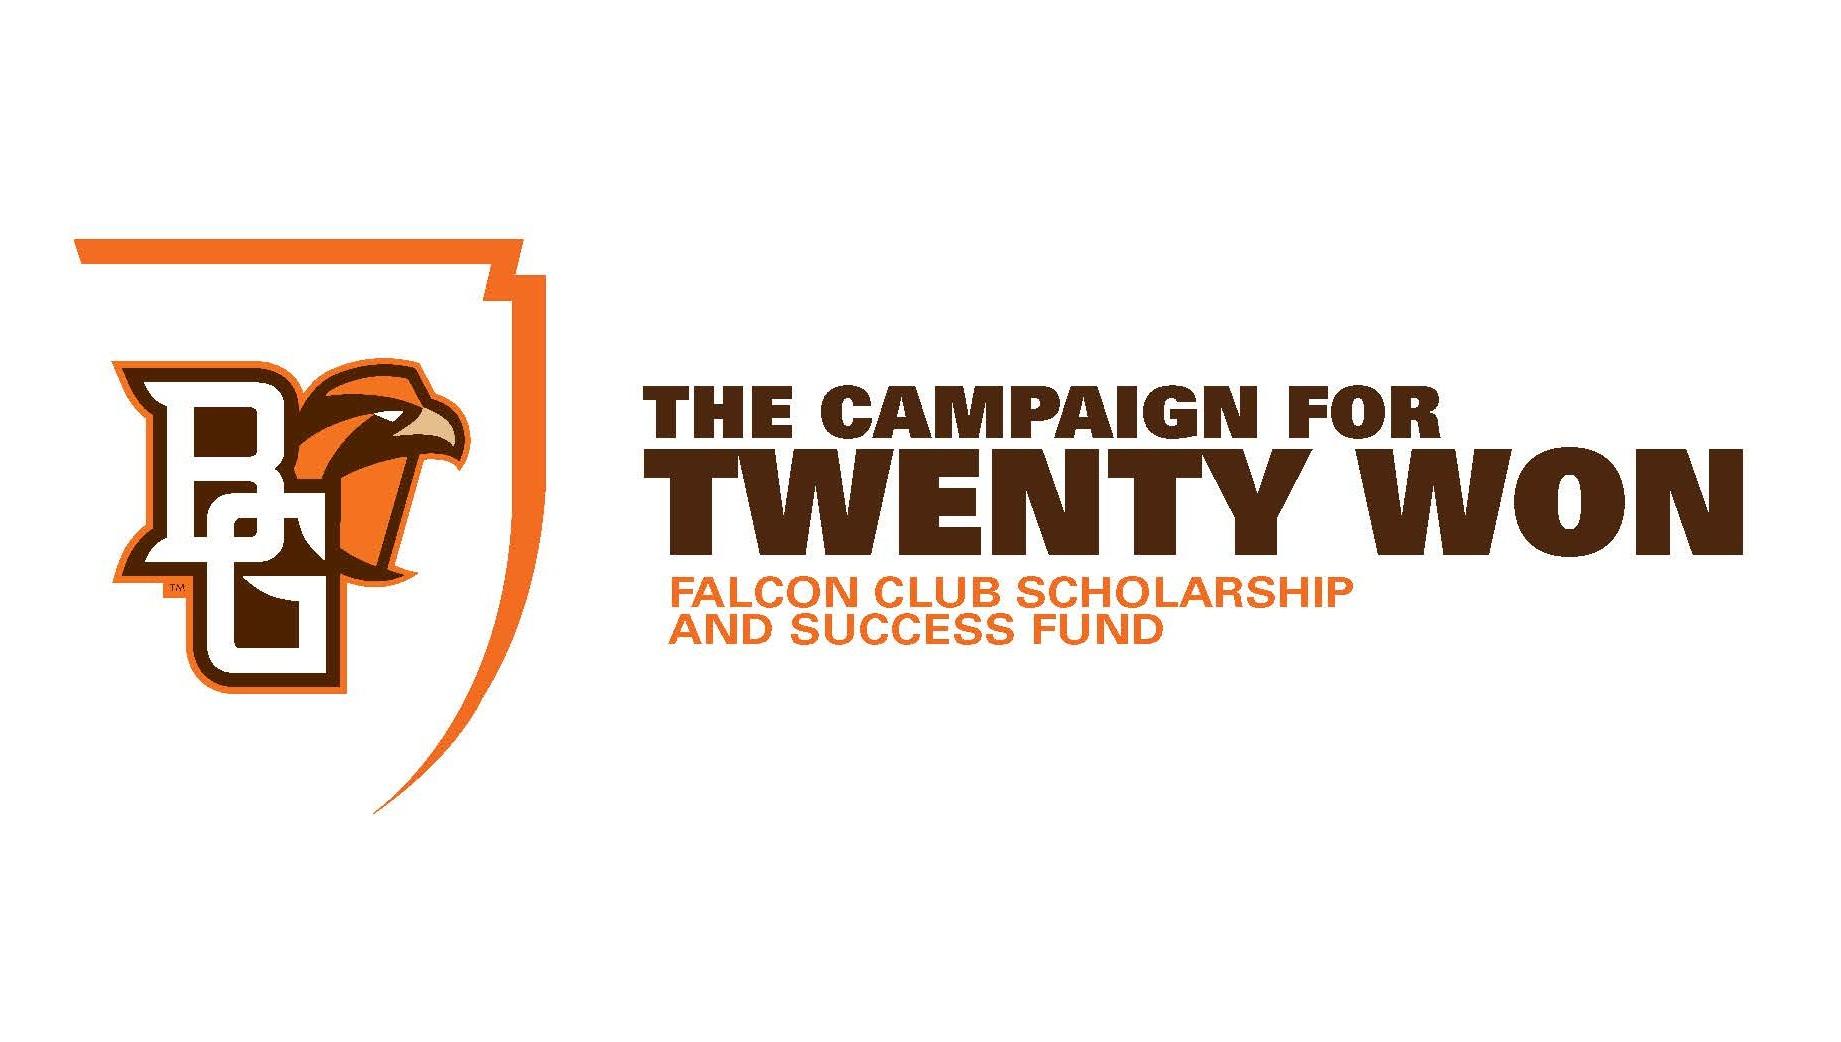 The Campaign for Twenty Won